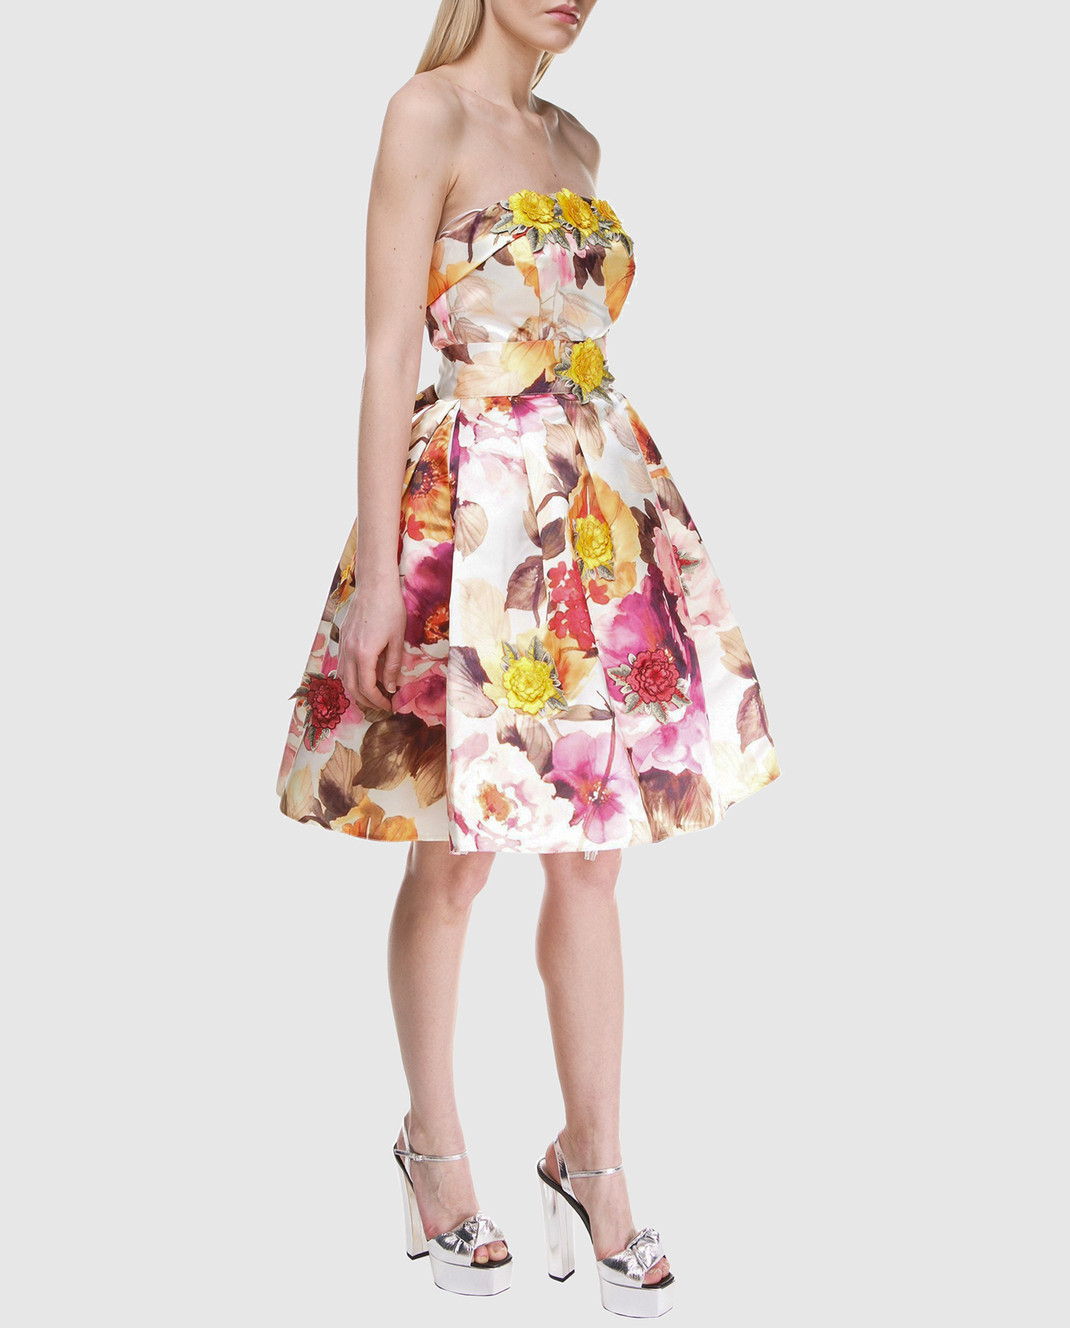 Philipp Plein Платье WRG0534 изображение 2